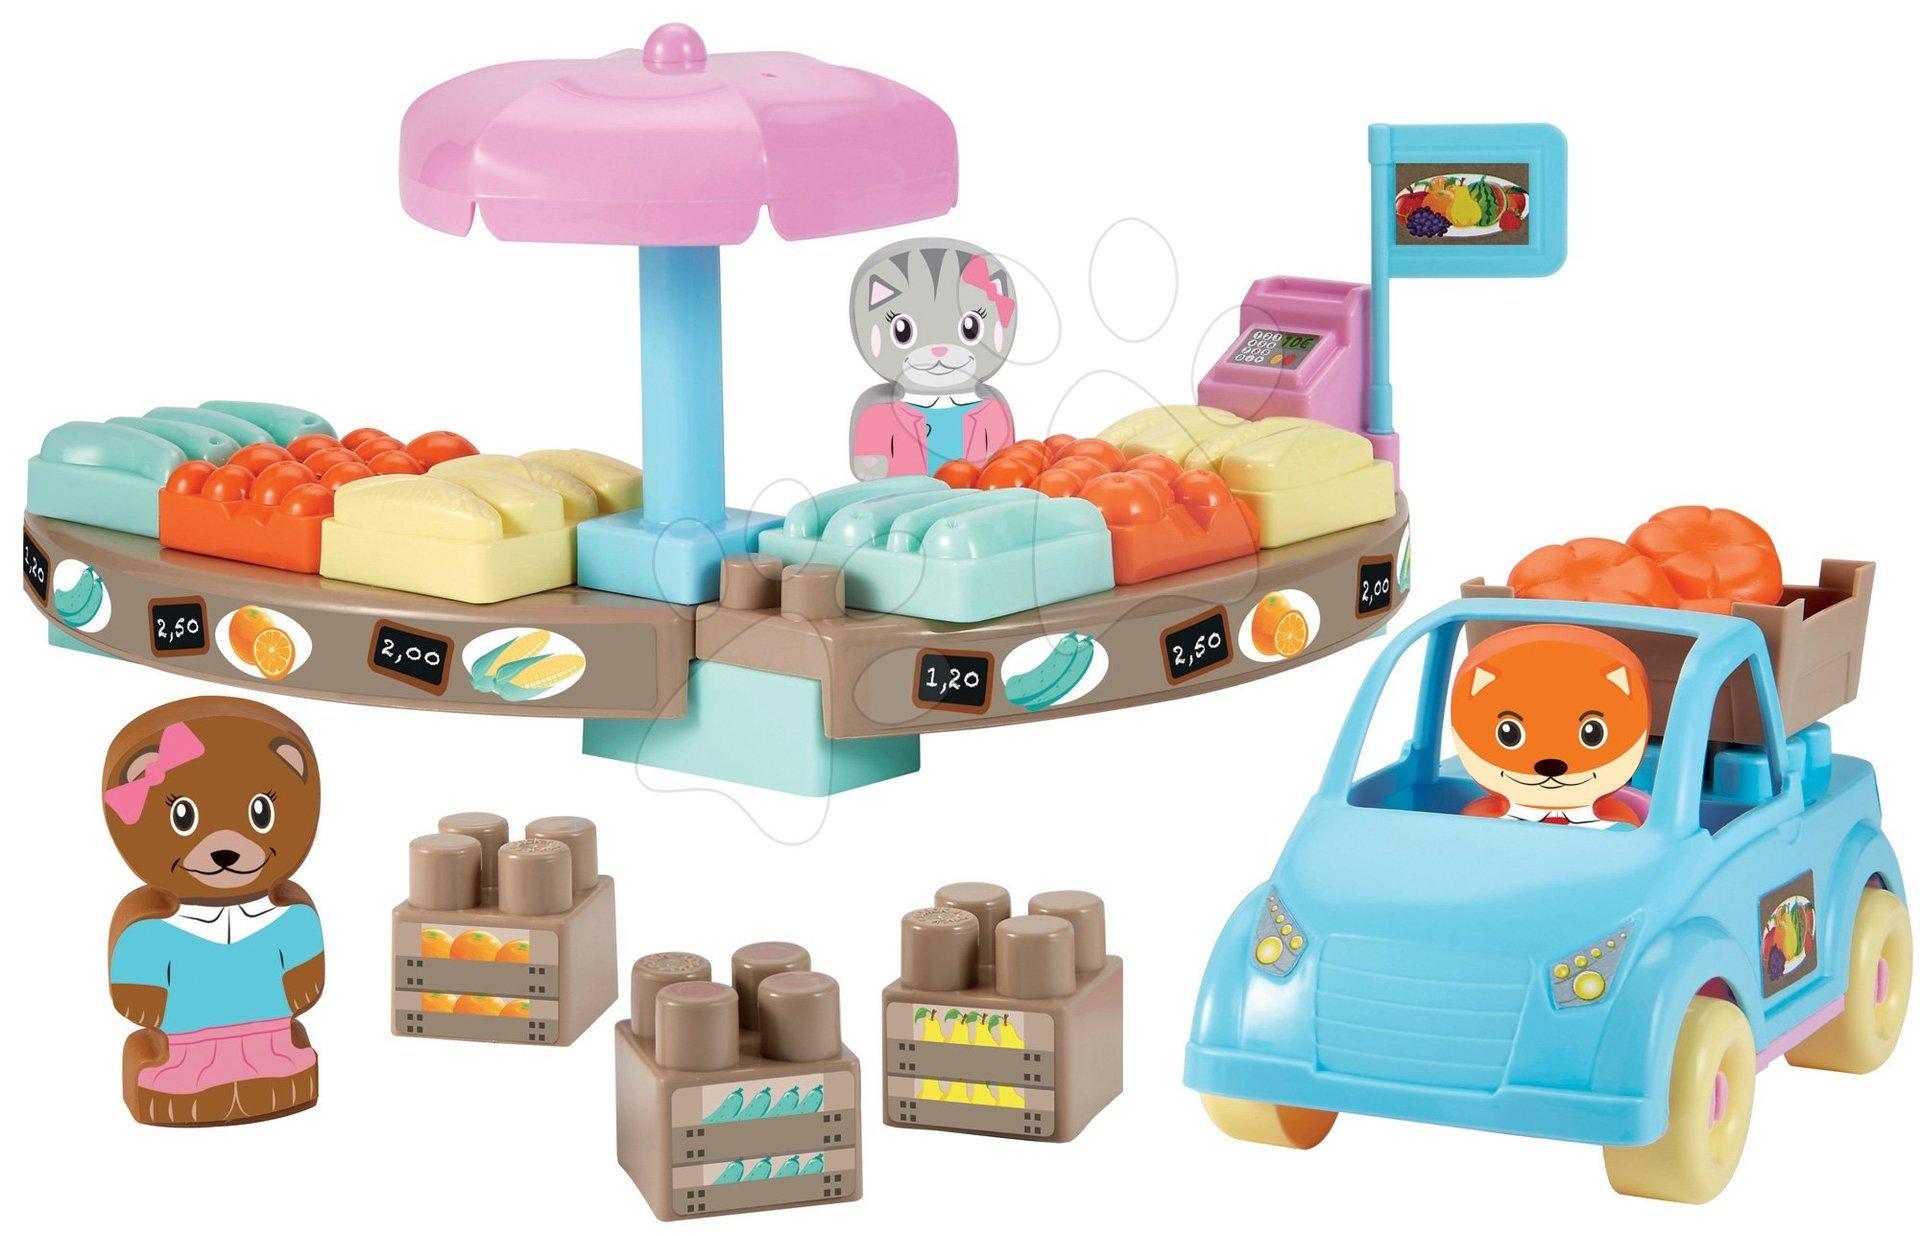 Stavebnica obchod Twee Pop Abrick Écoiffier s autom a 3 postavičkami zvieratkami od 18 mes